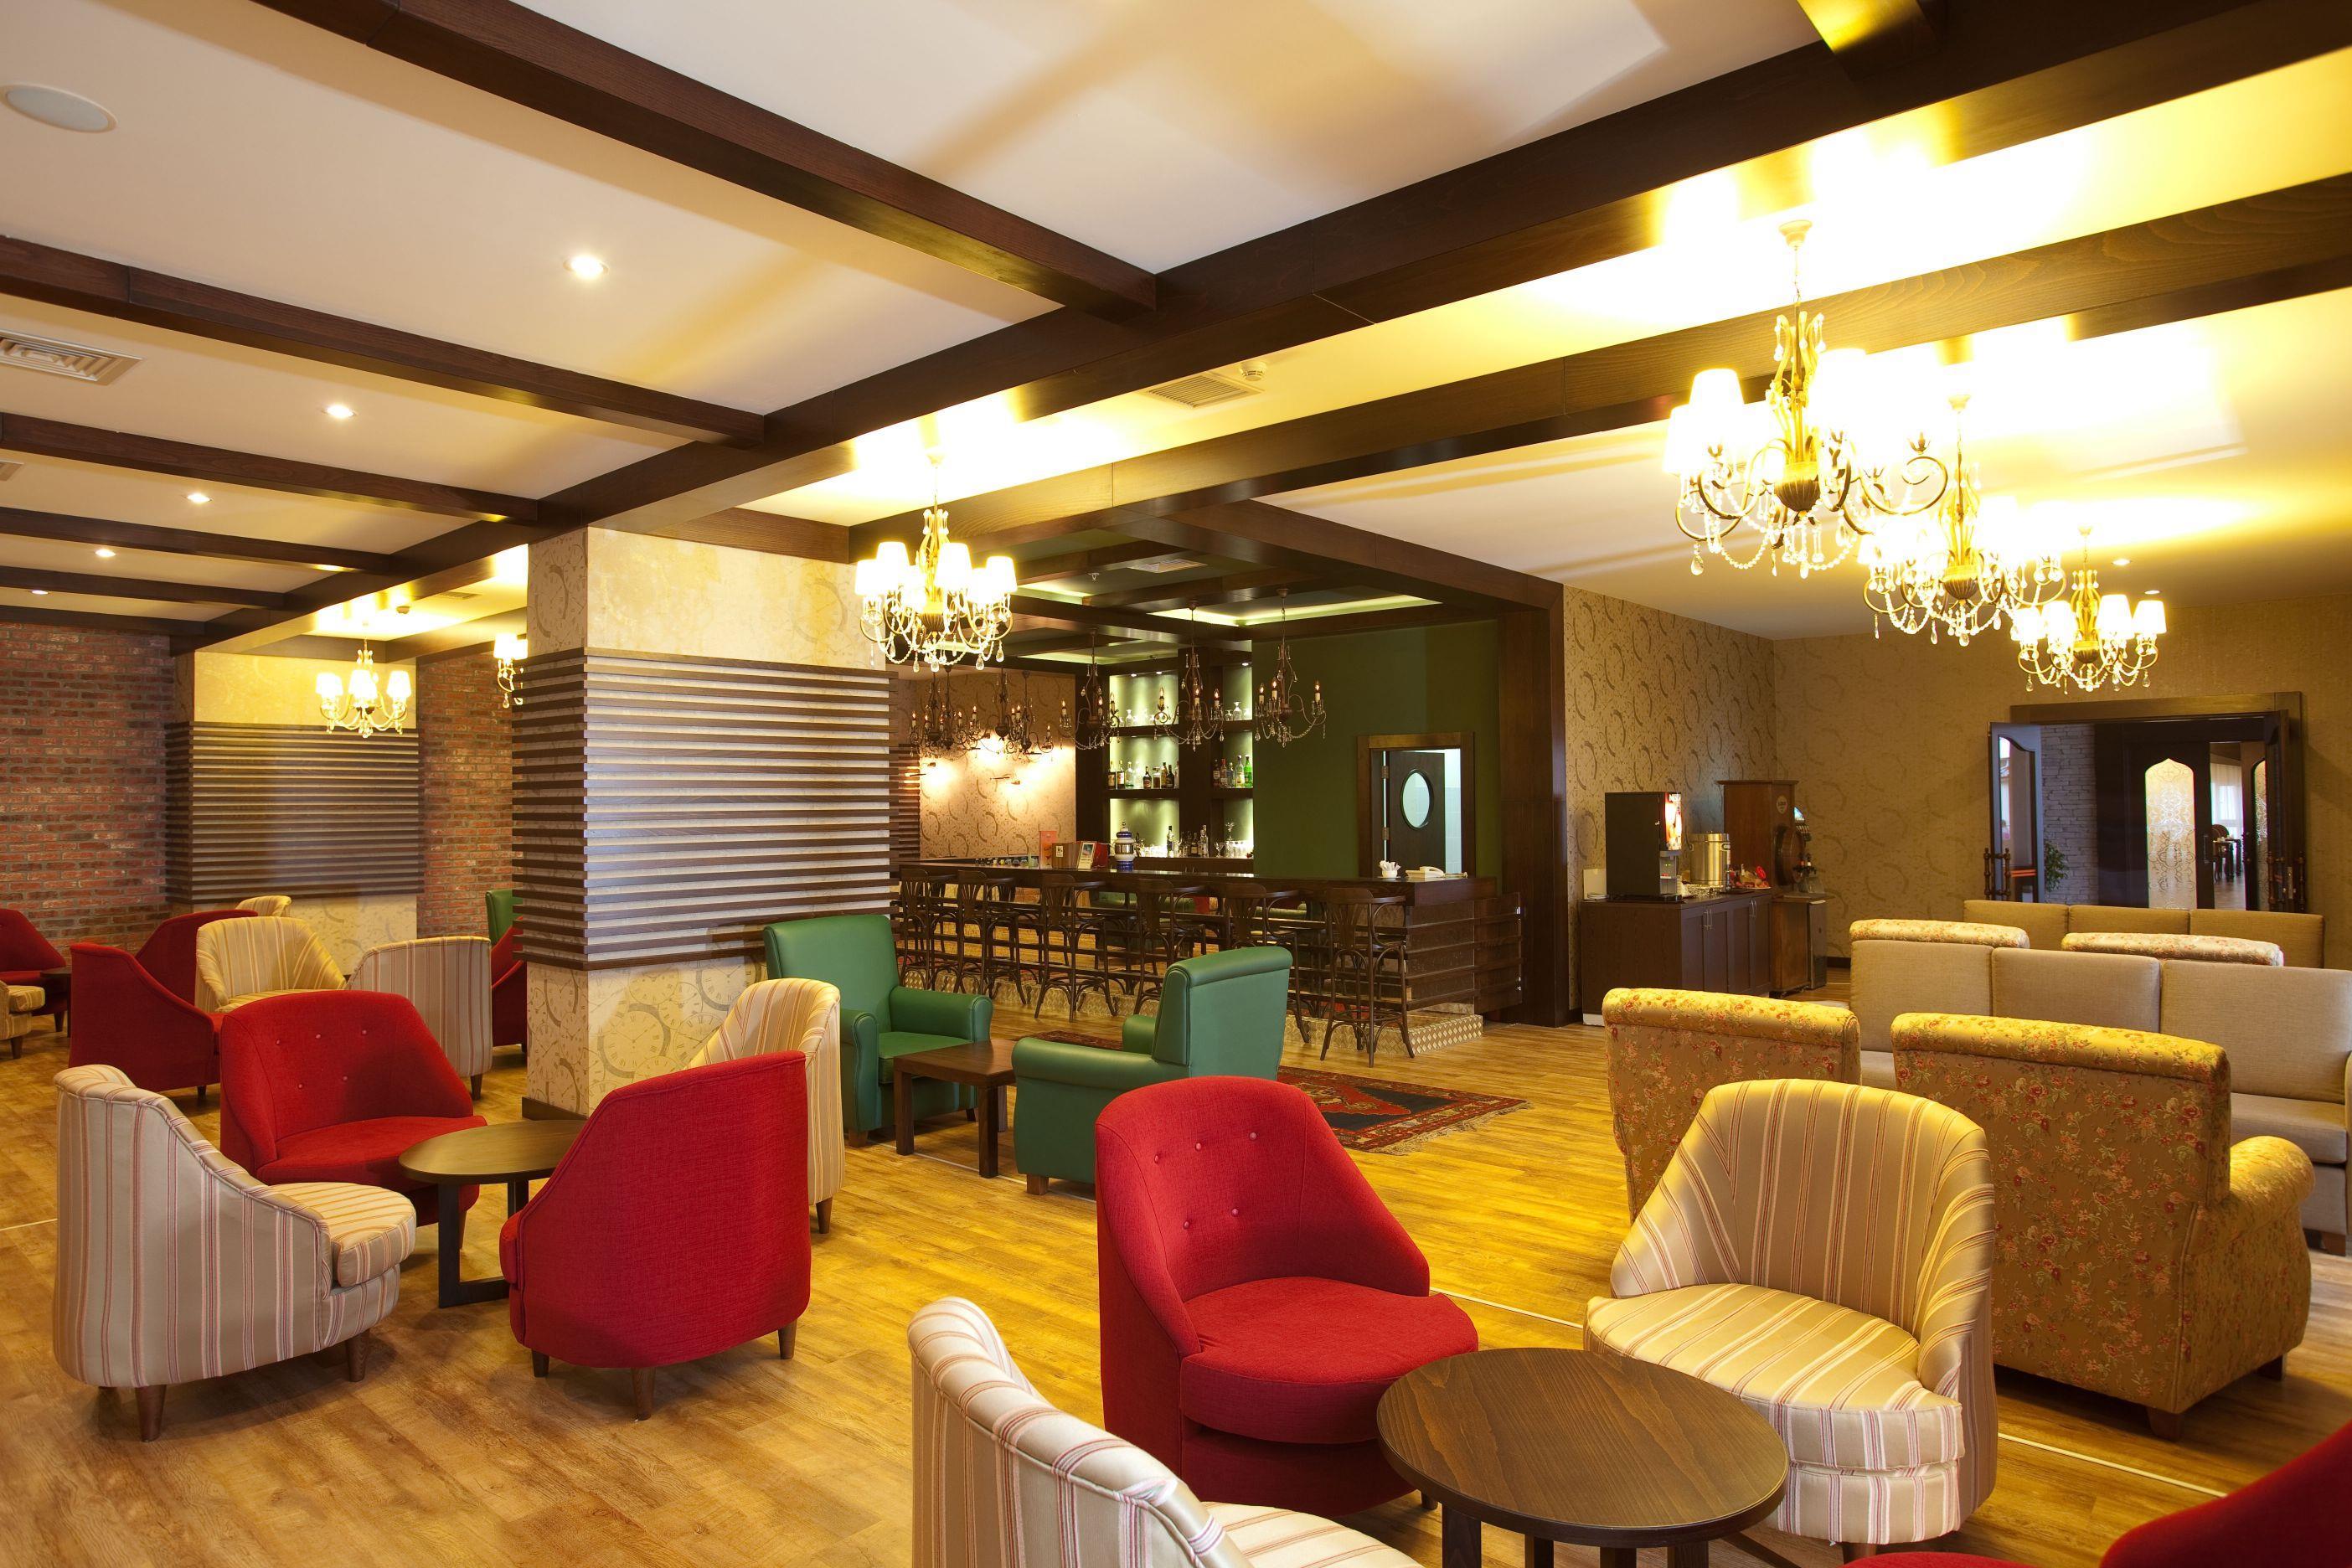 http://www.orextravel.sk/OREX/hotelphotos/stella-beach-hotel-alanya-general-0011.jpg